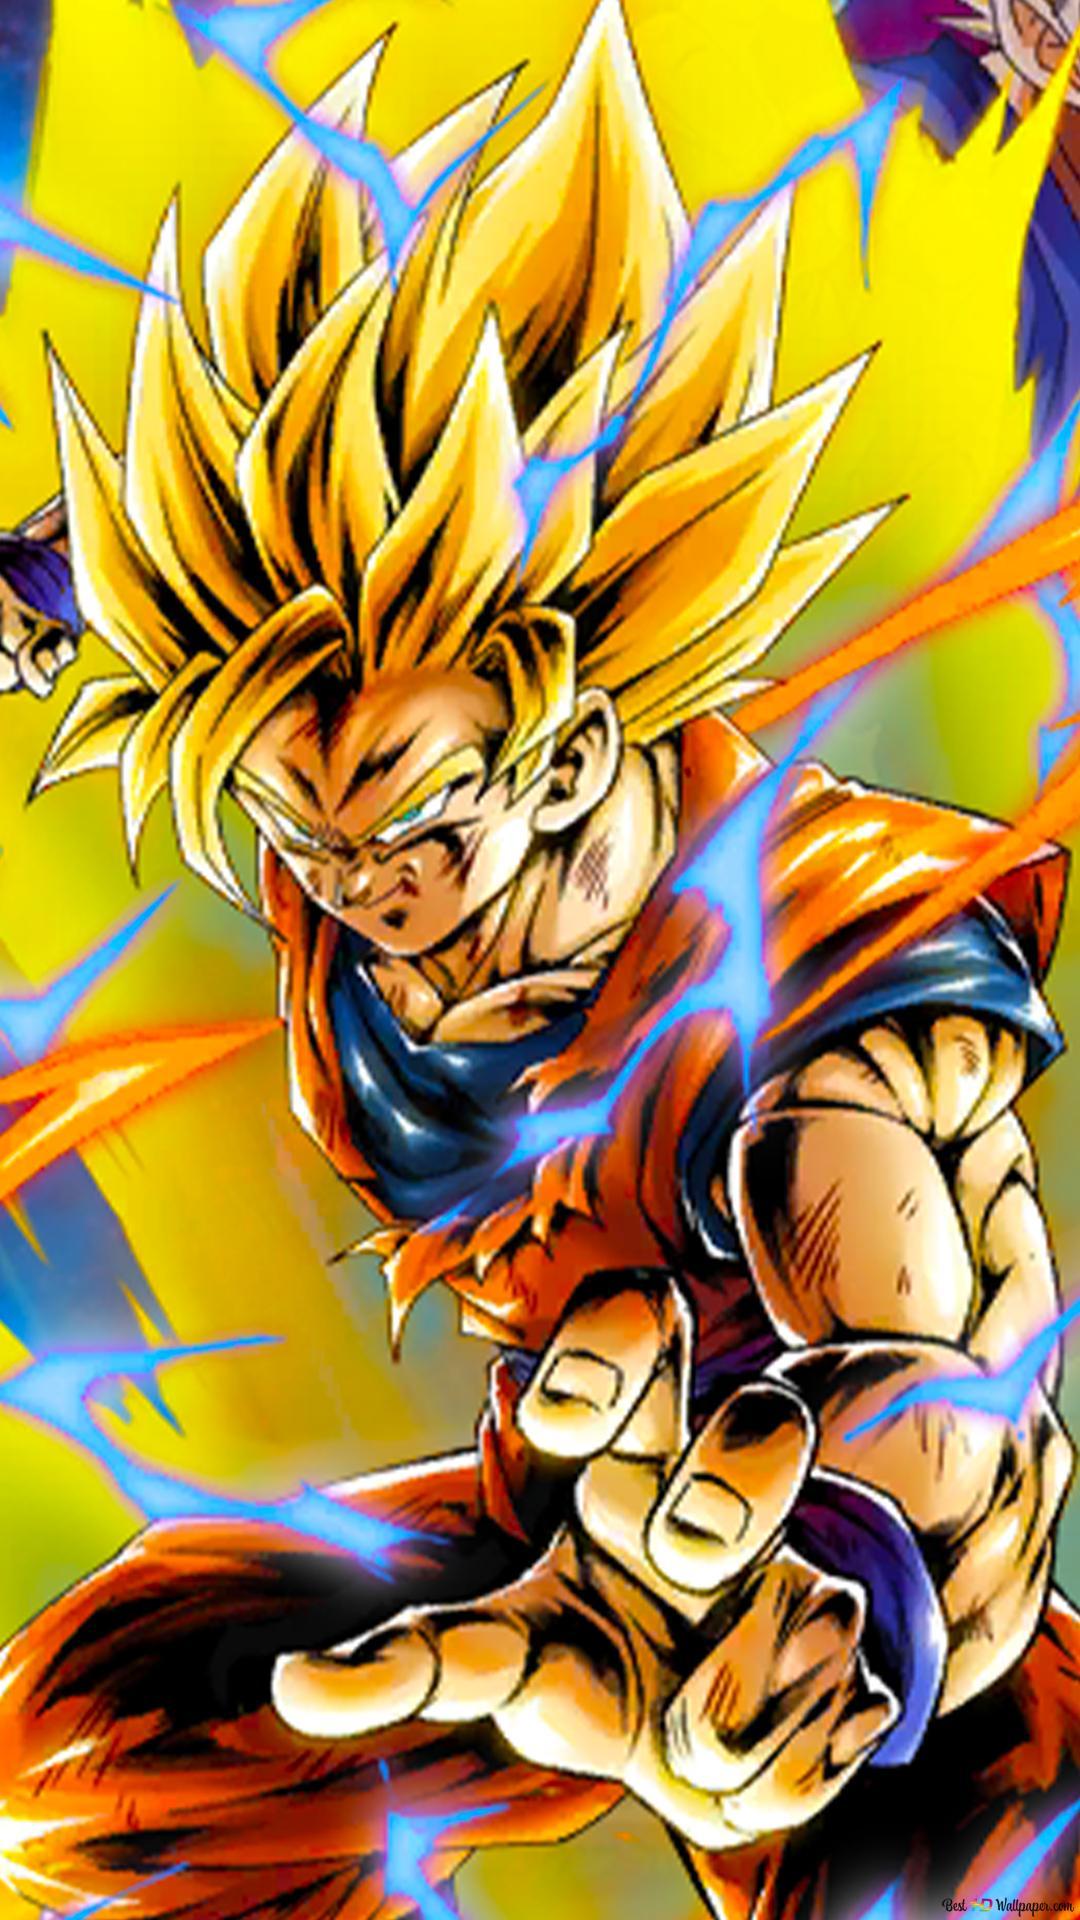 Super Saiyan 2 Goku From Dragon Ball Z Dragon Ball Legends Arts For Desktop Hd Wallpaper Download